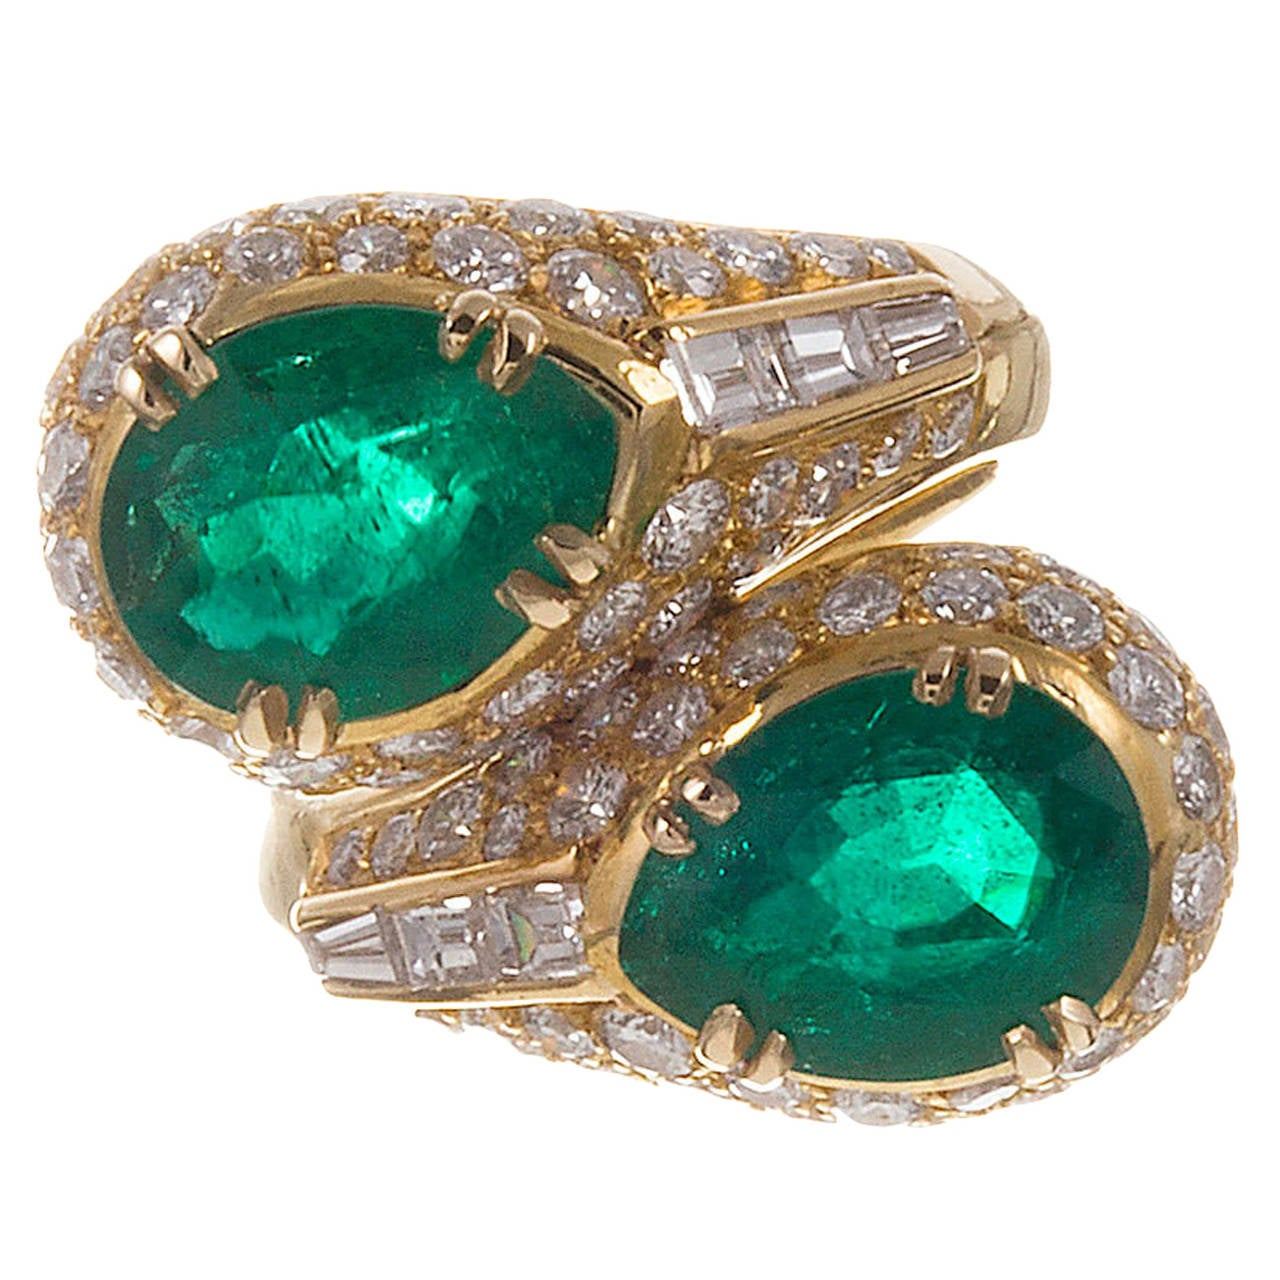 magnificent bulgari pear shape emerald ring at 1stdibs